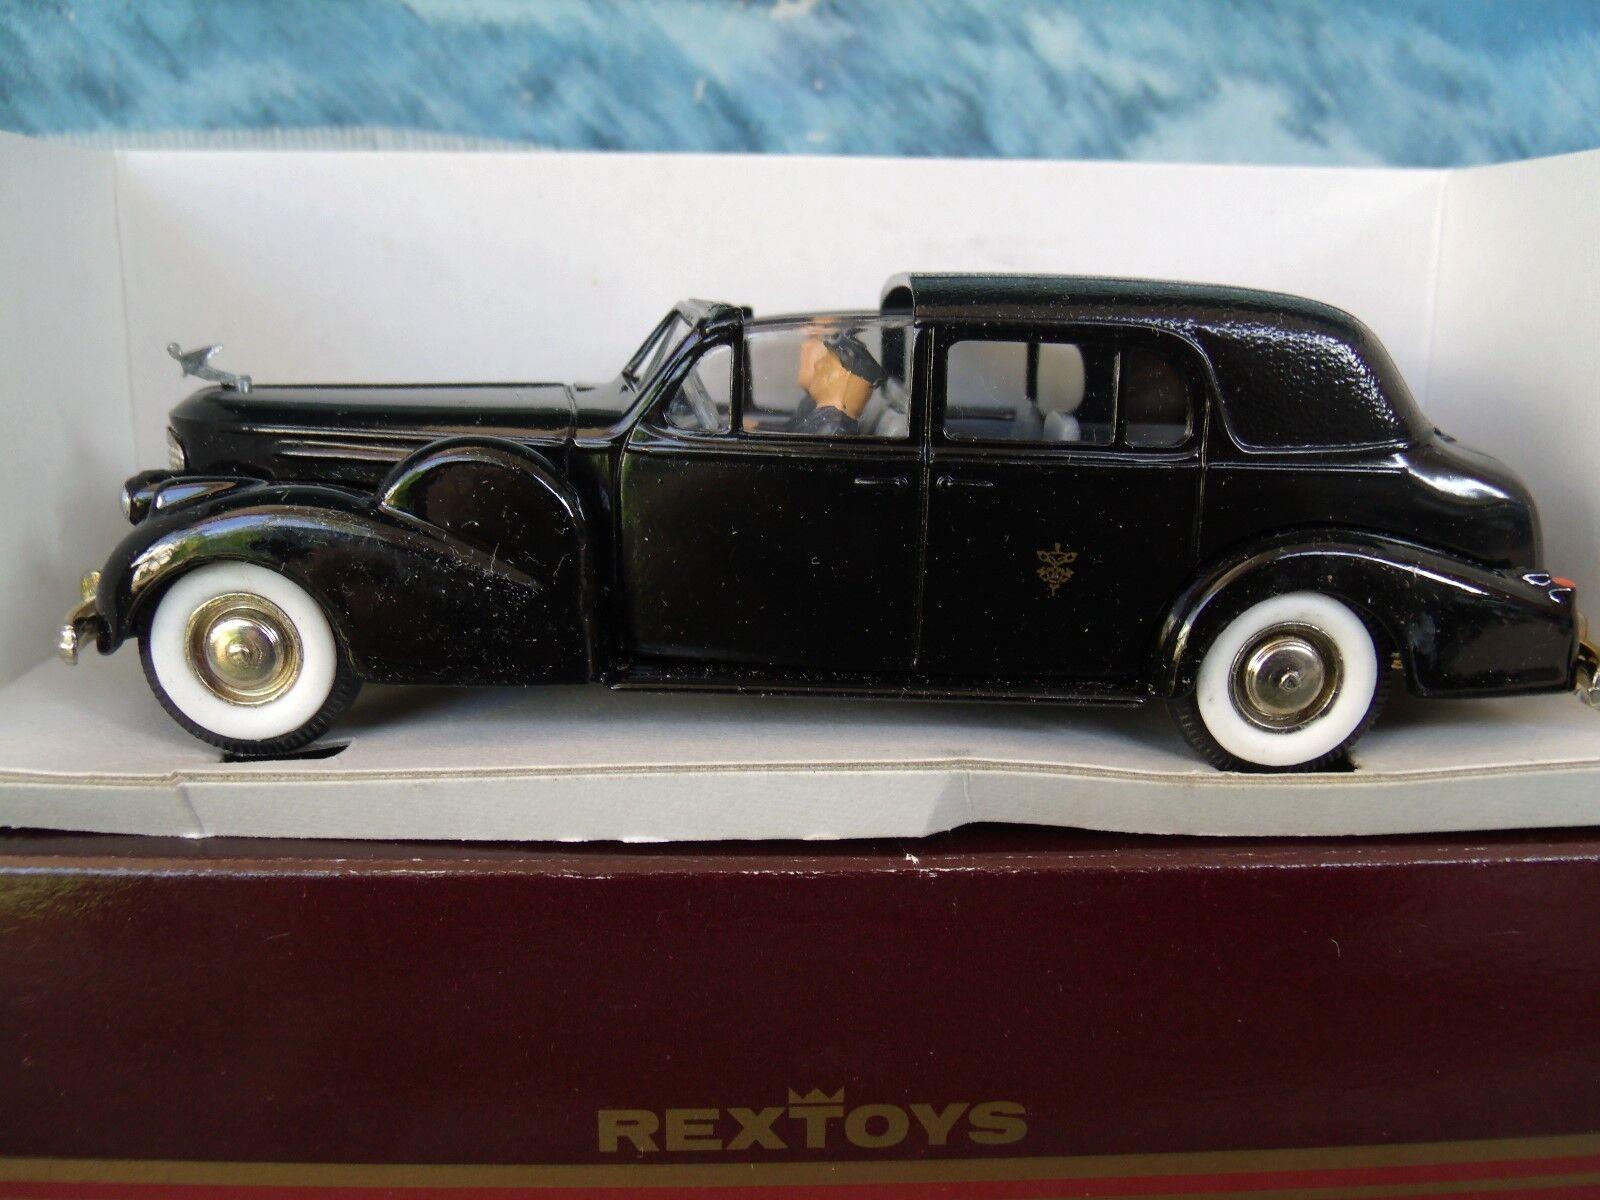 distribución global 1 43 RexJuguetes (Portugal) (Portugal) (Portugal) 1938-1940 Cadillac V 16 Coupe De S.s Pie XII  70% de descuento